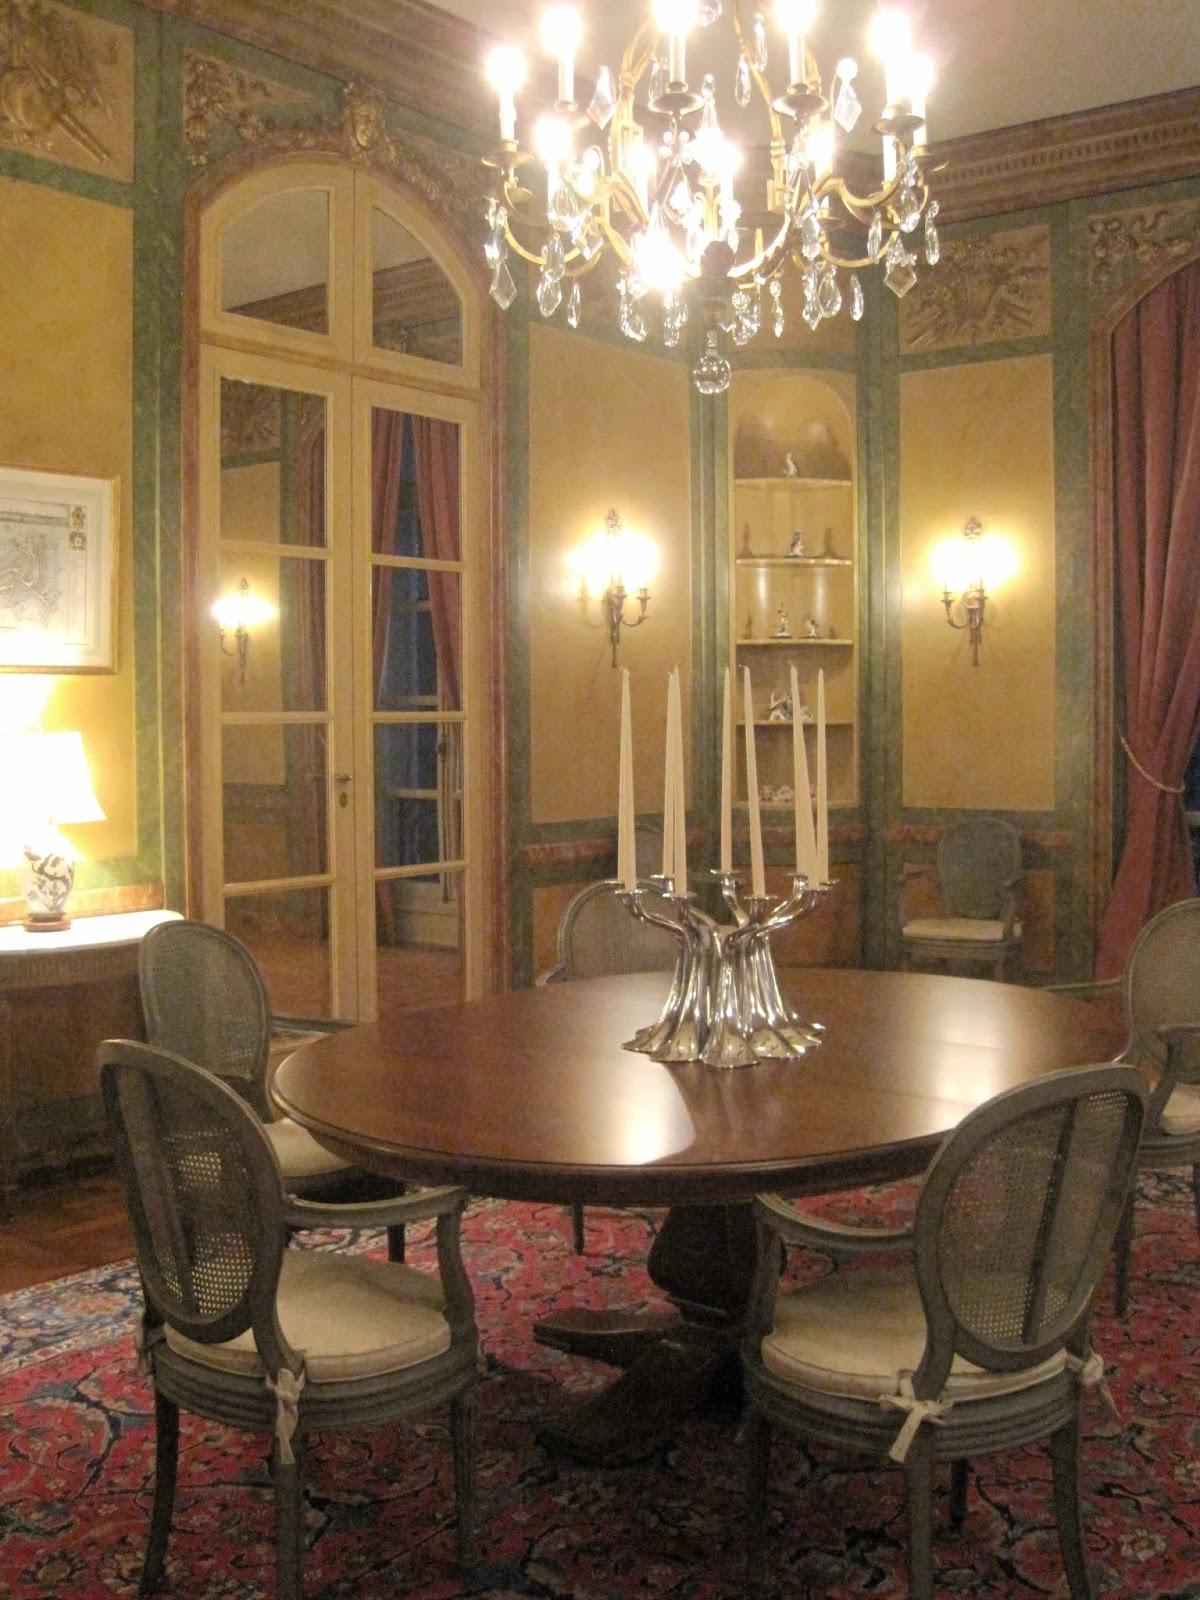 ambassador dining room. Belgian ambassador s residence interiors 2  Salon Dining Rooms Harrison Architect Designs